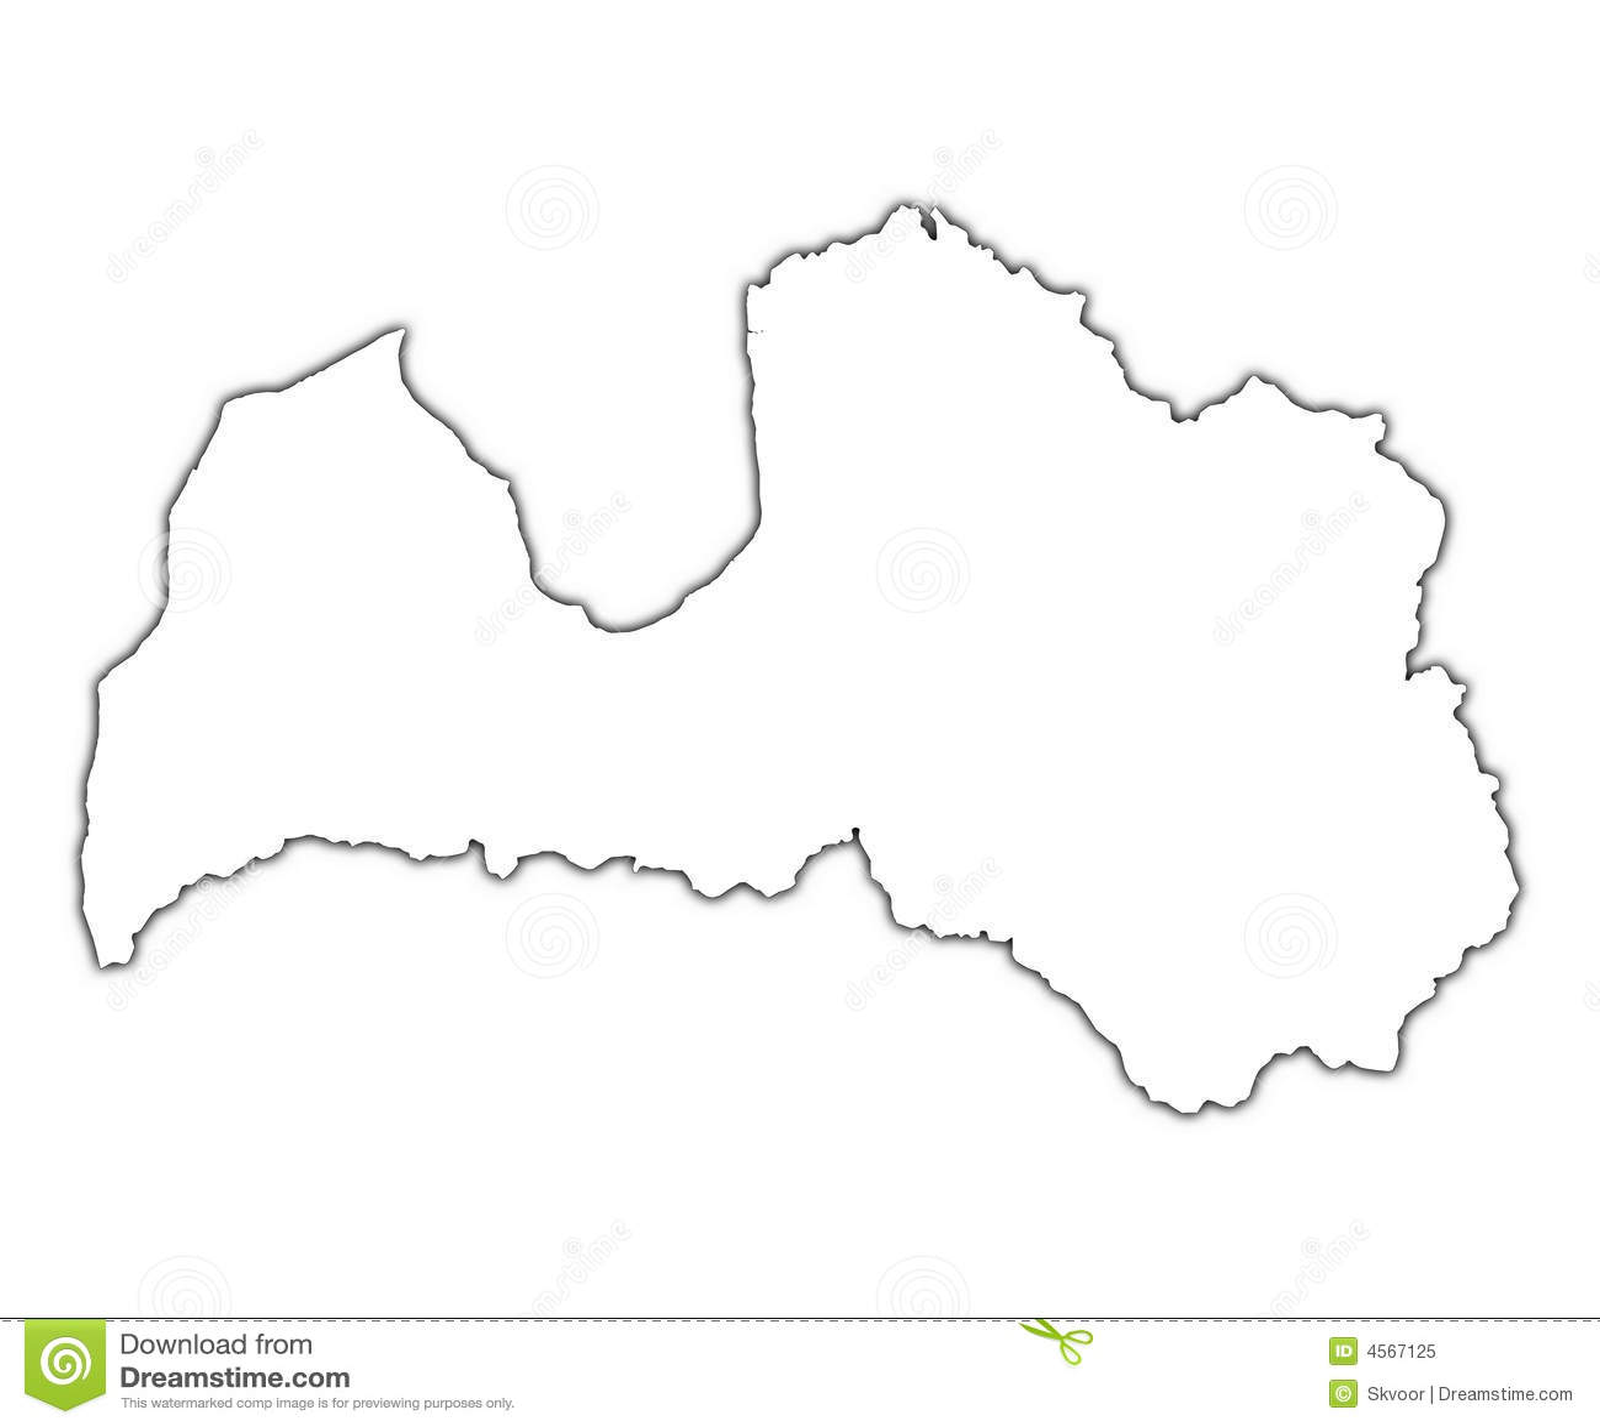 Latvia outline map stock illustration illustration of clipping latvia outline map publicscrutiny Gallery